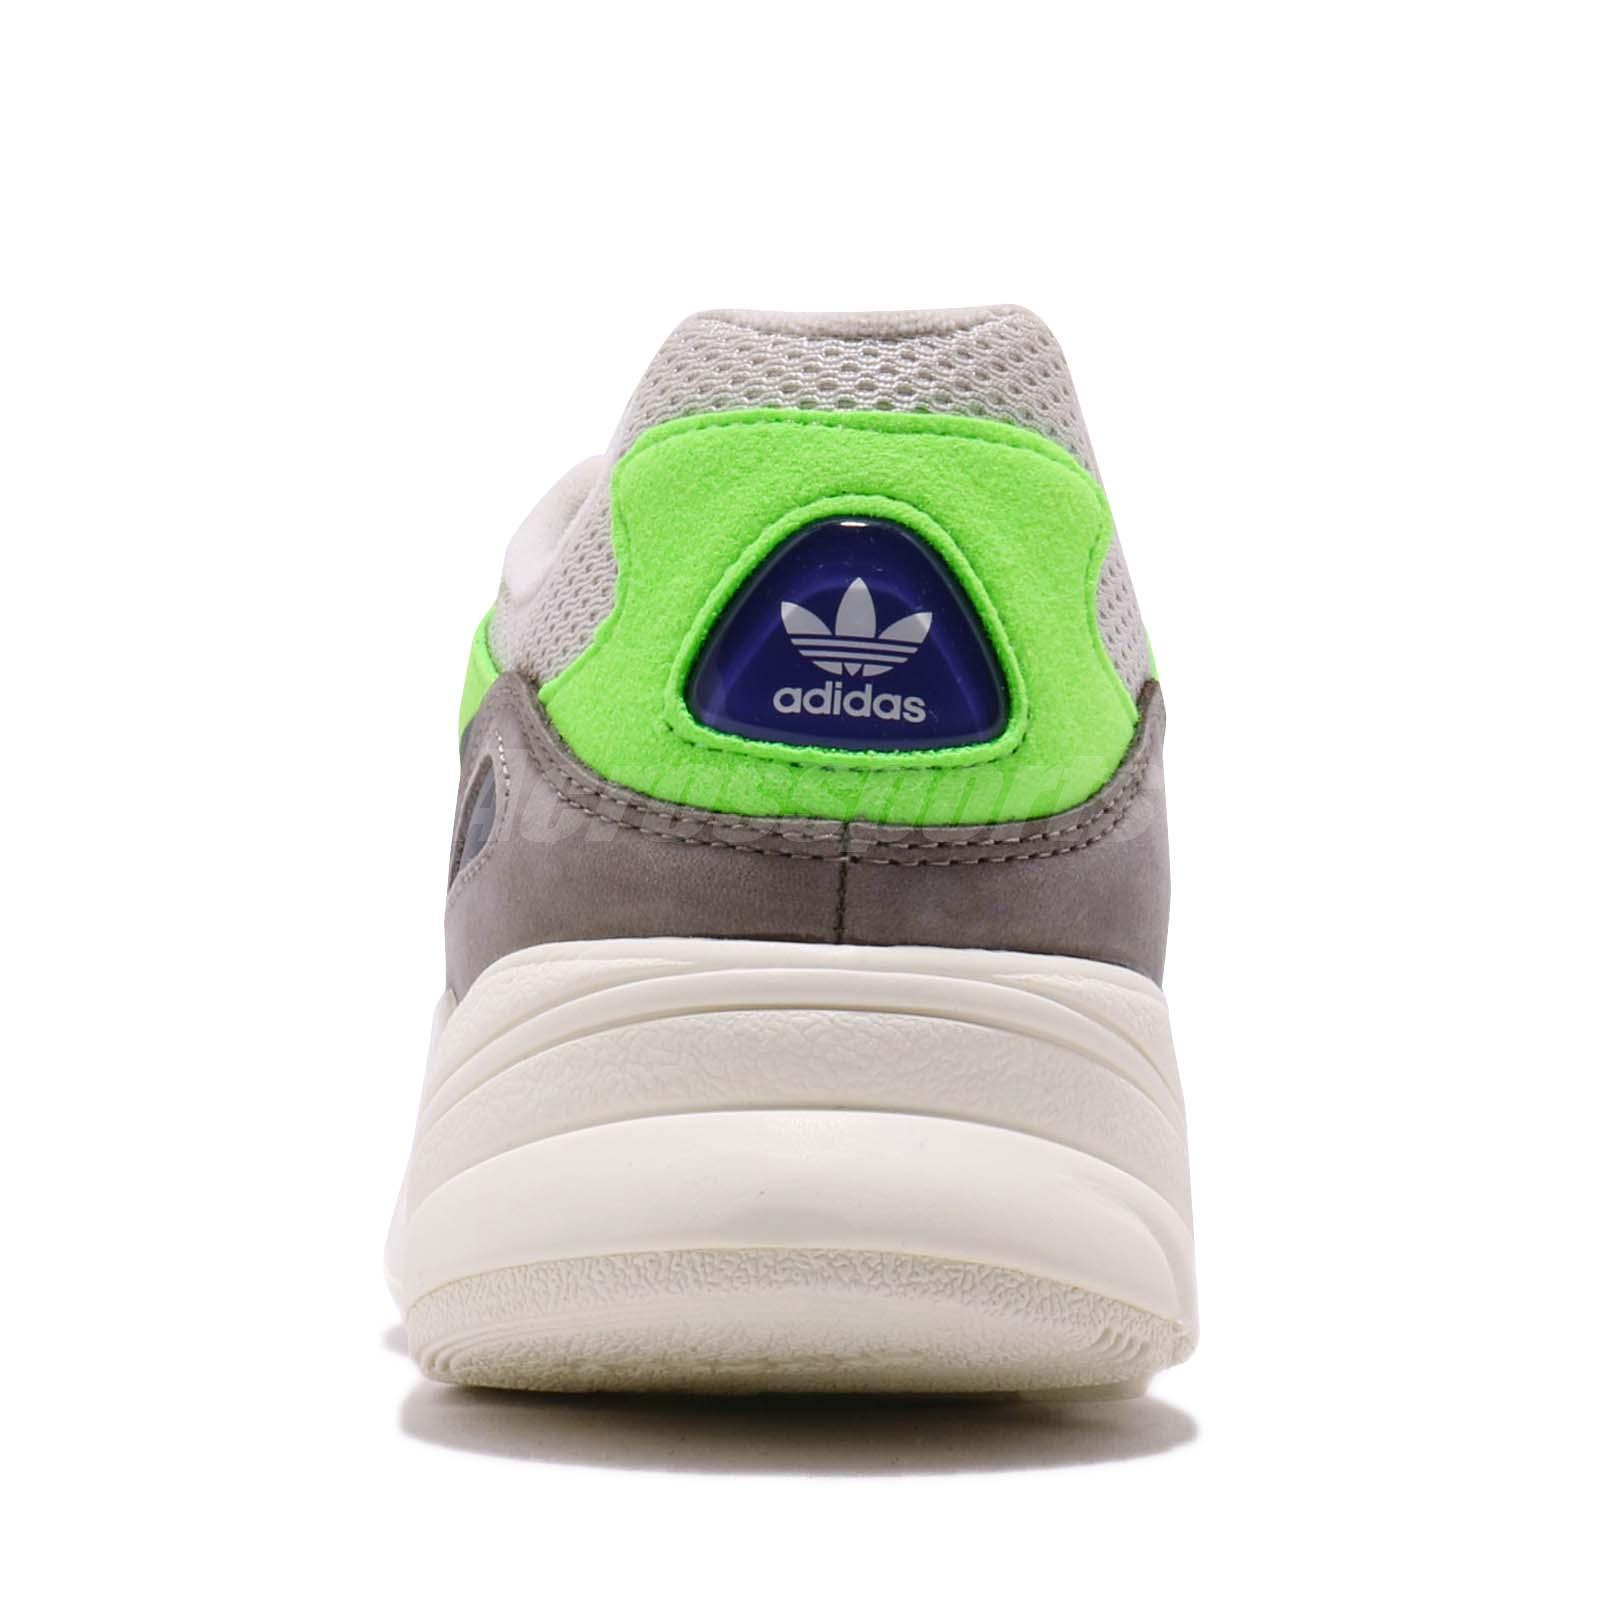 e8cd914cb8a4 adidas Originals Yung-96 Solar Green Off White Grey Men Running ...